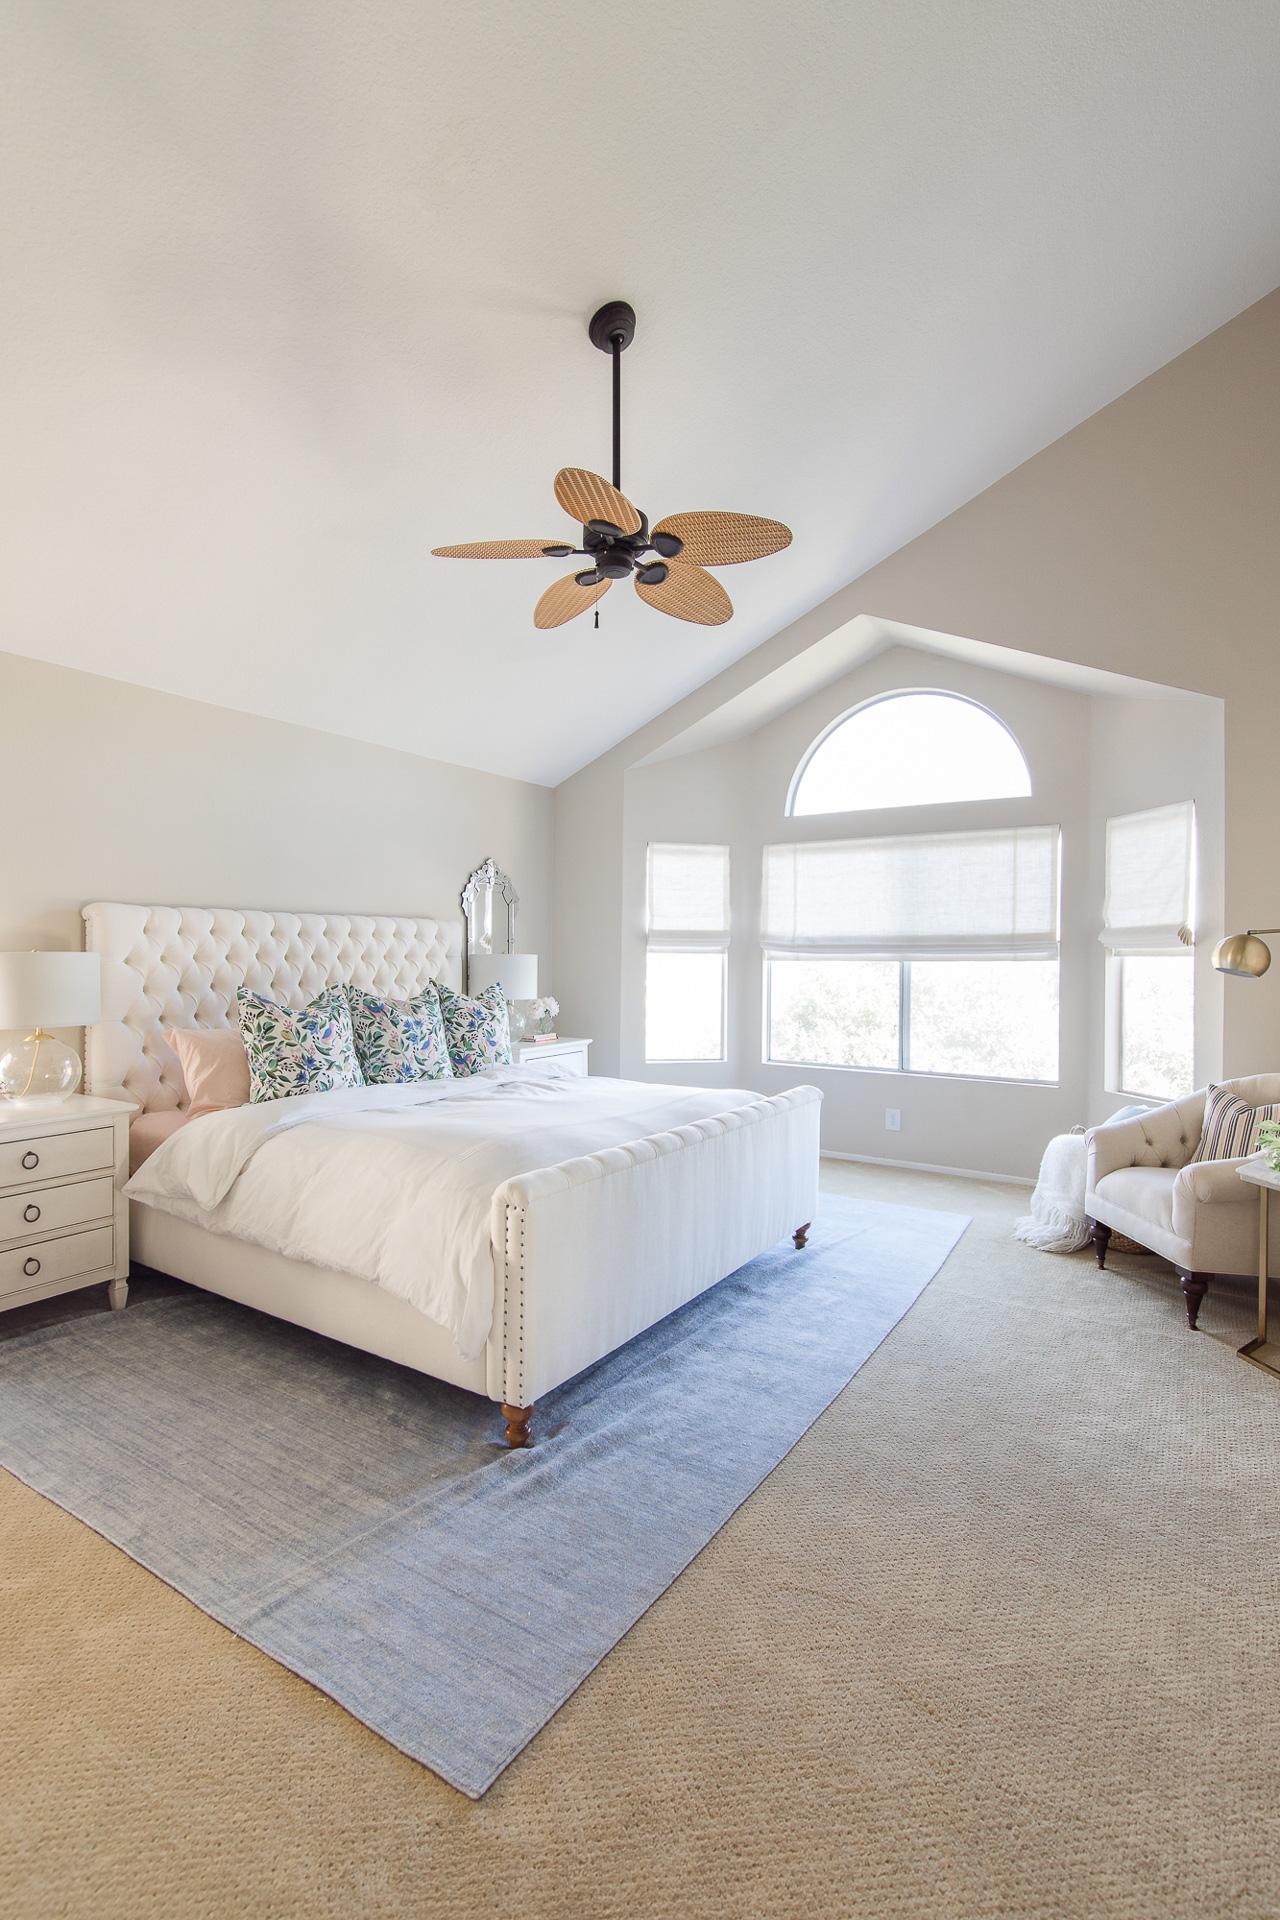 I love my neutral bedroom decor! - M Loves M @marmar